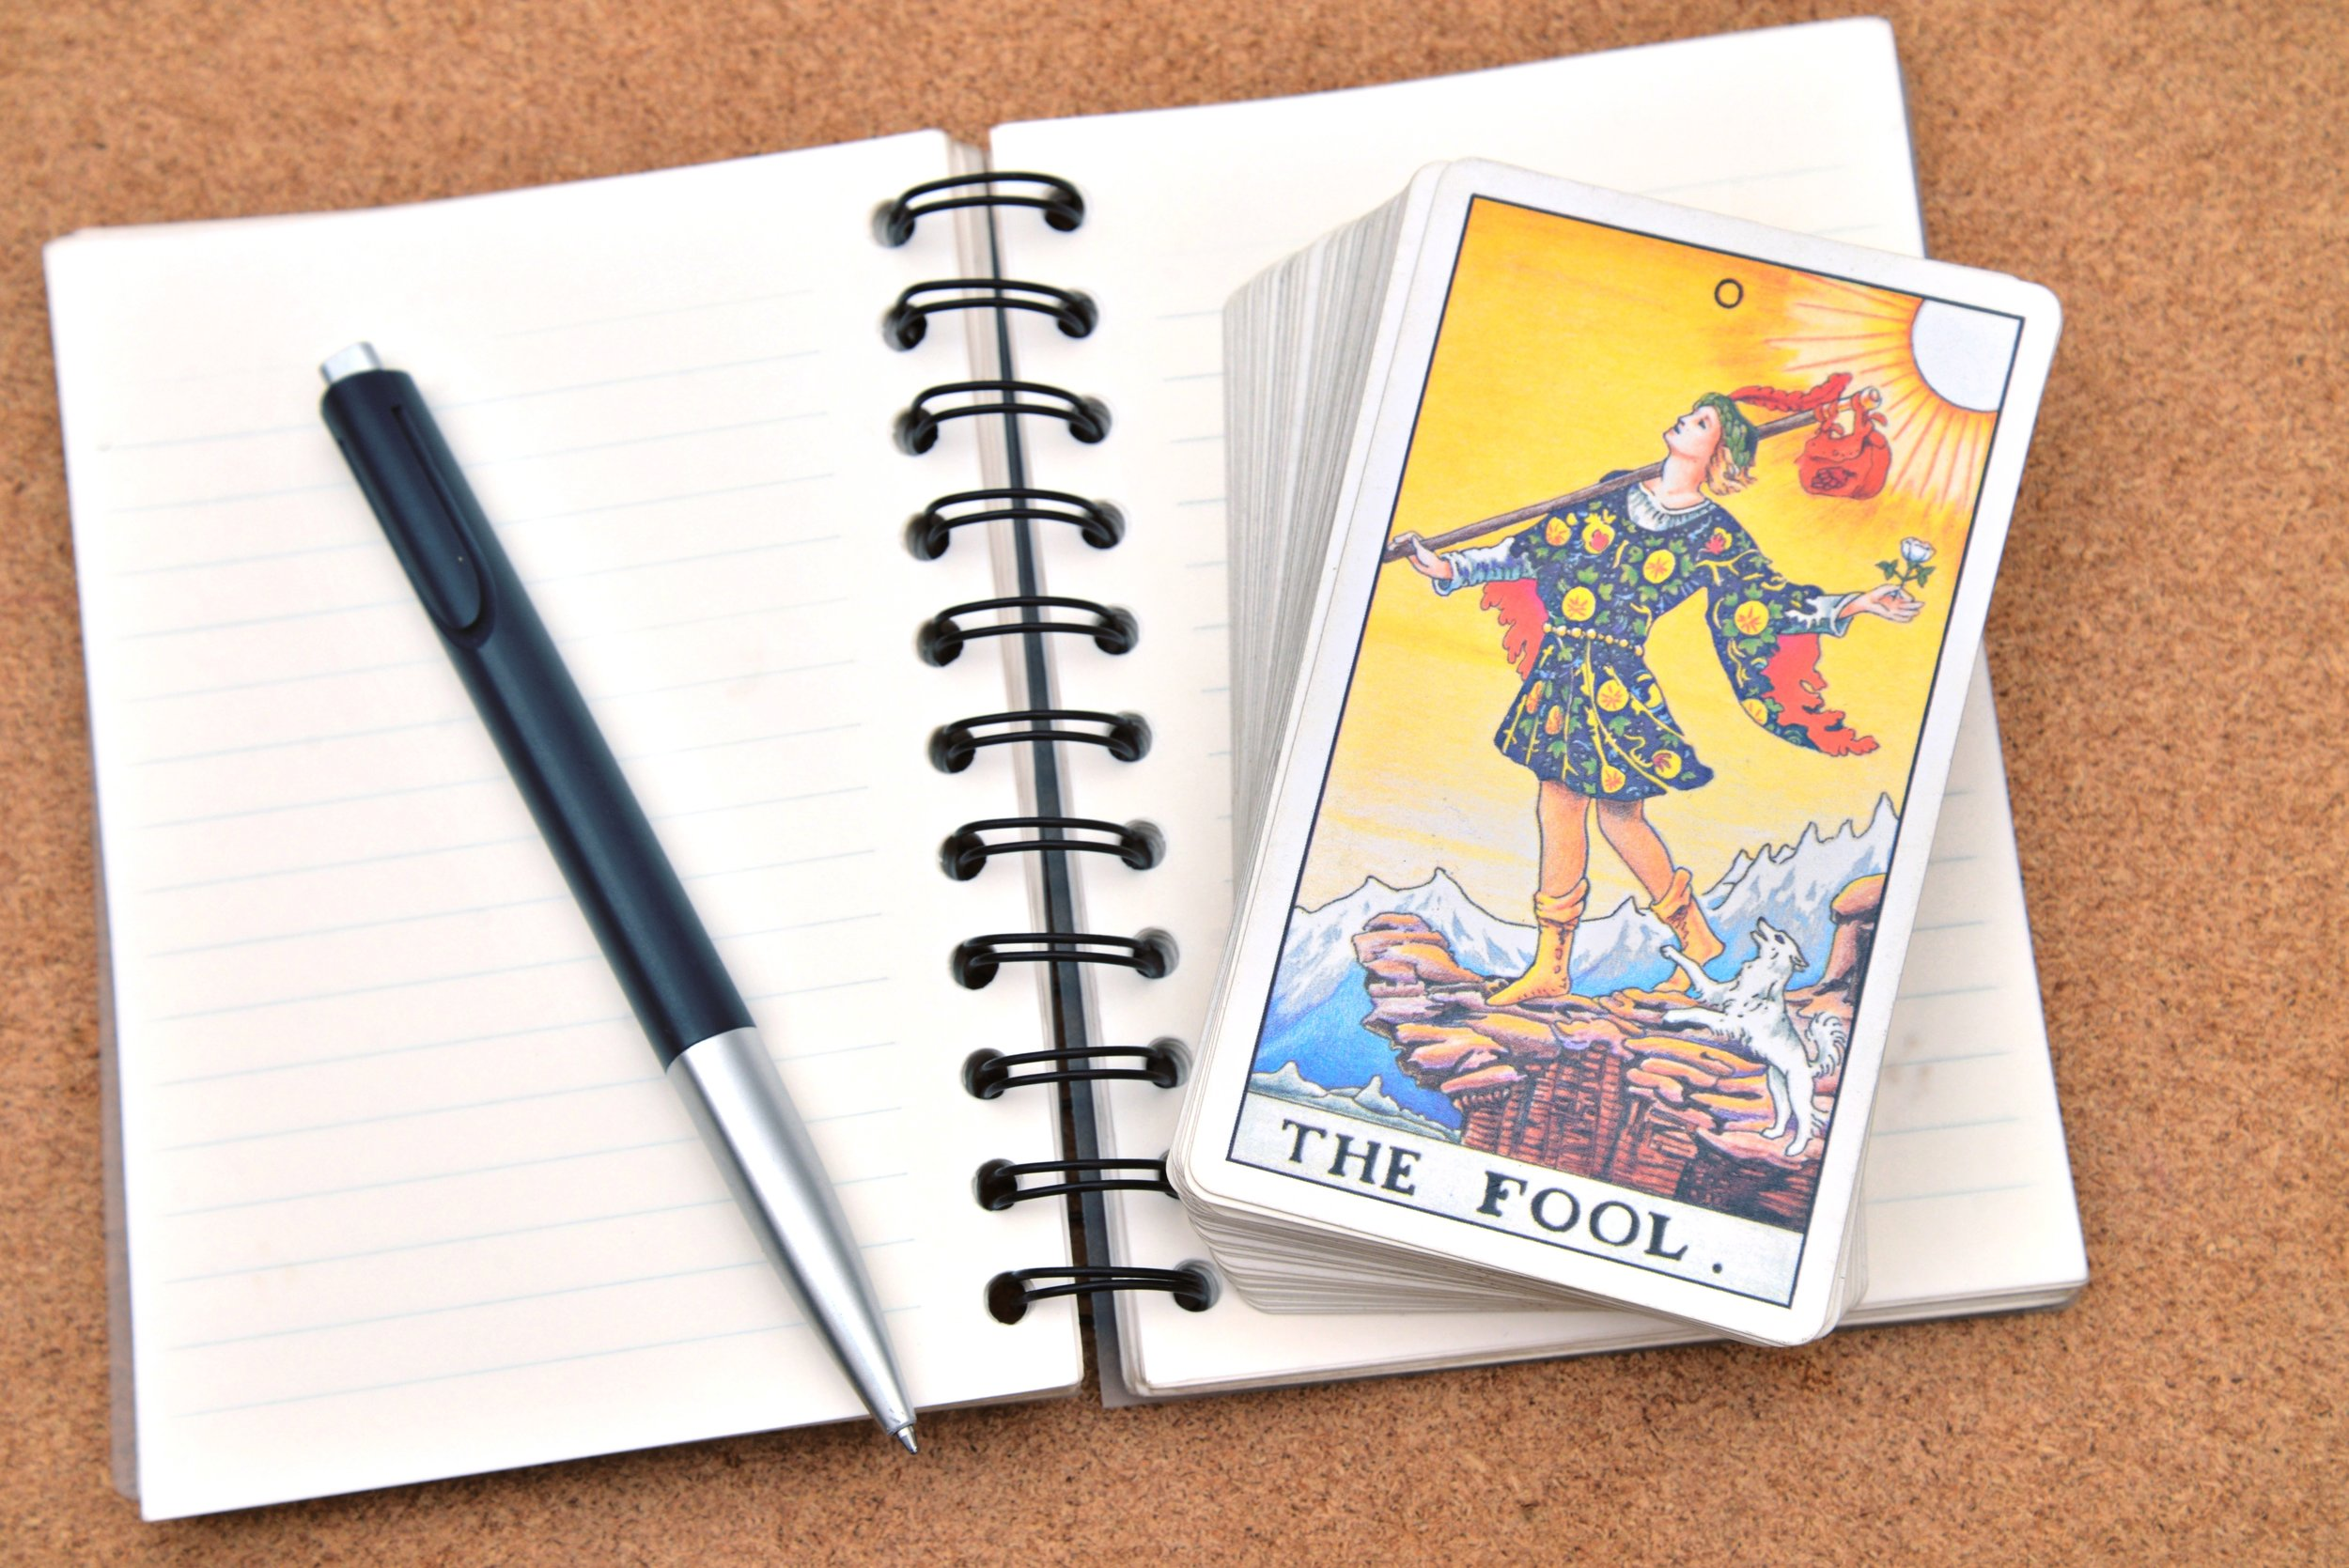 Tarot cards - The Fool , on book